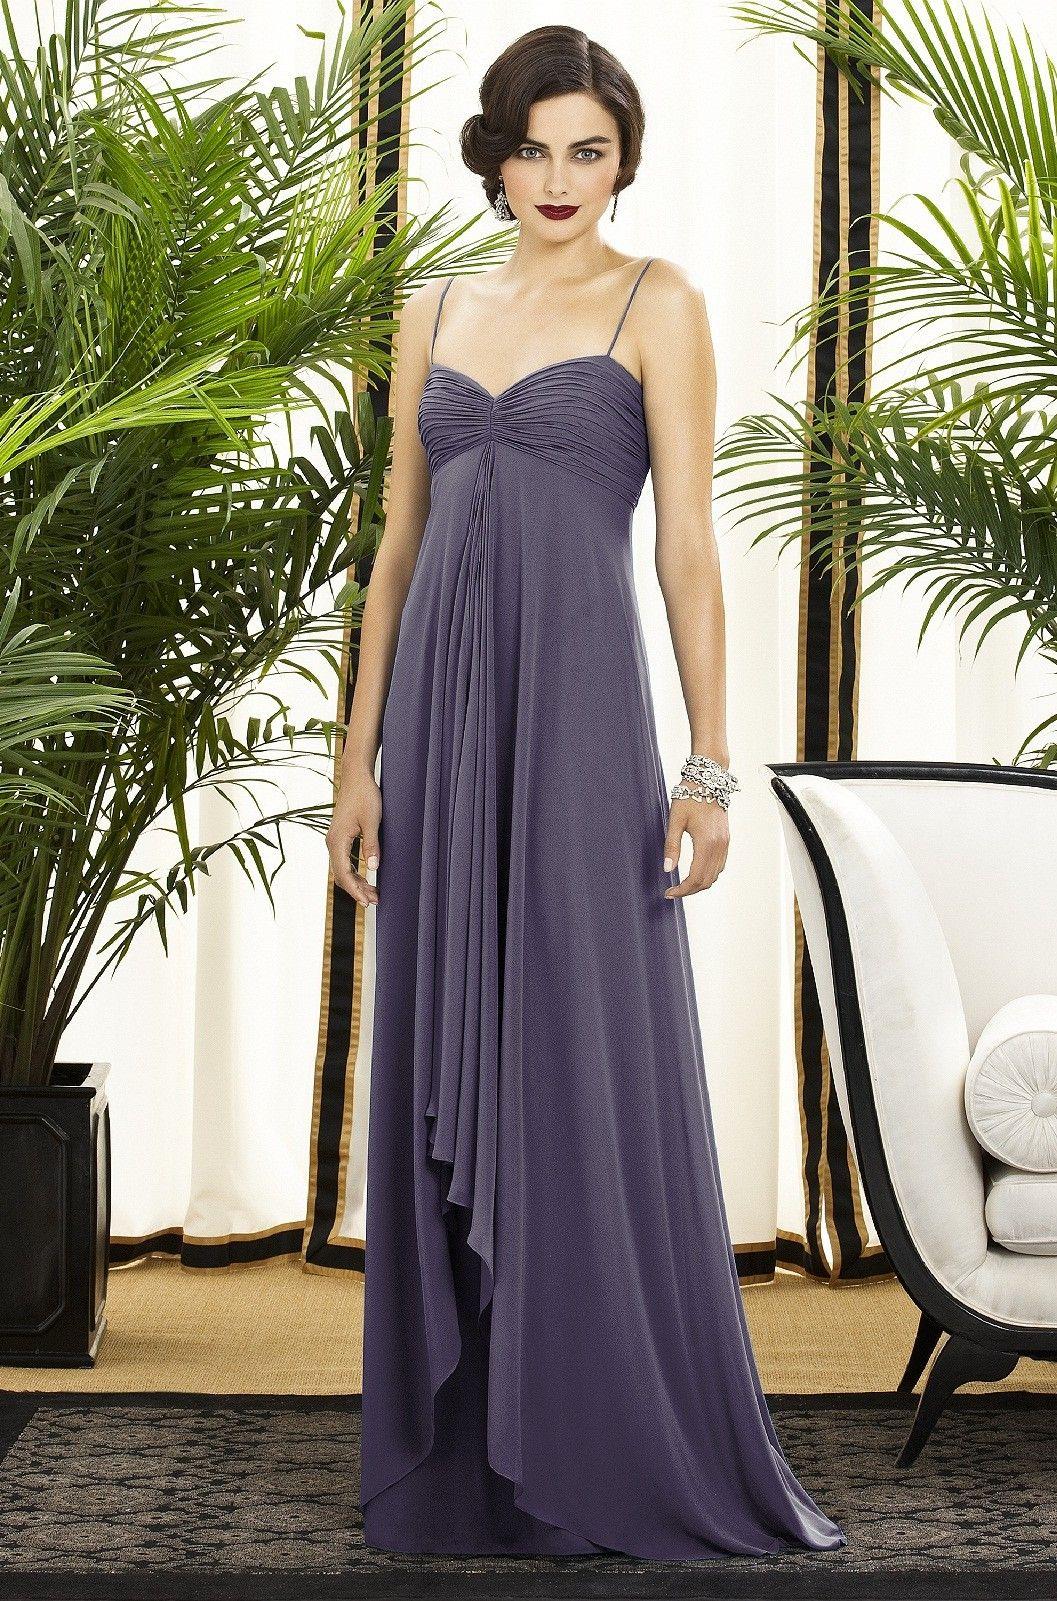 Dessy 2883 Bridesmaid Dress | Weddington Way | First comes love ...